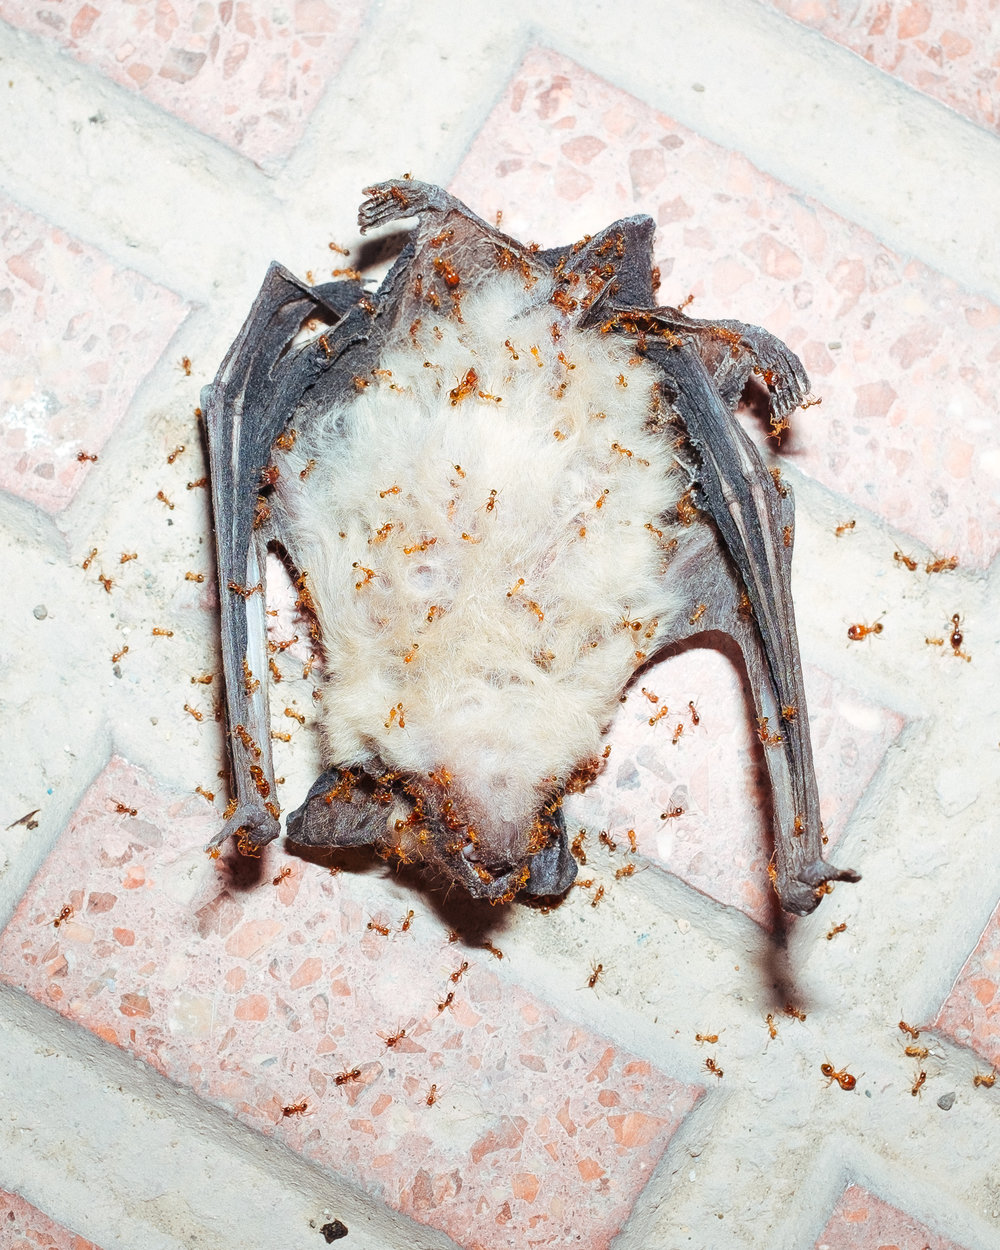 Dead Bat. © Jose David Valiente